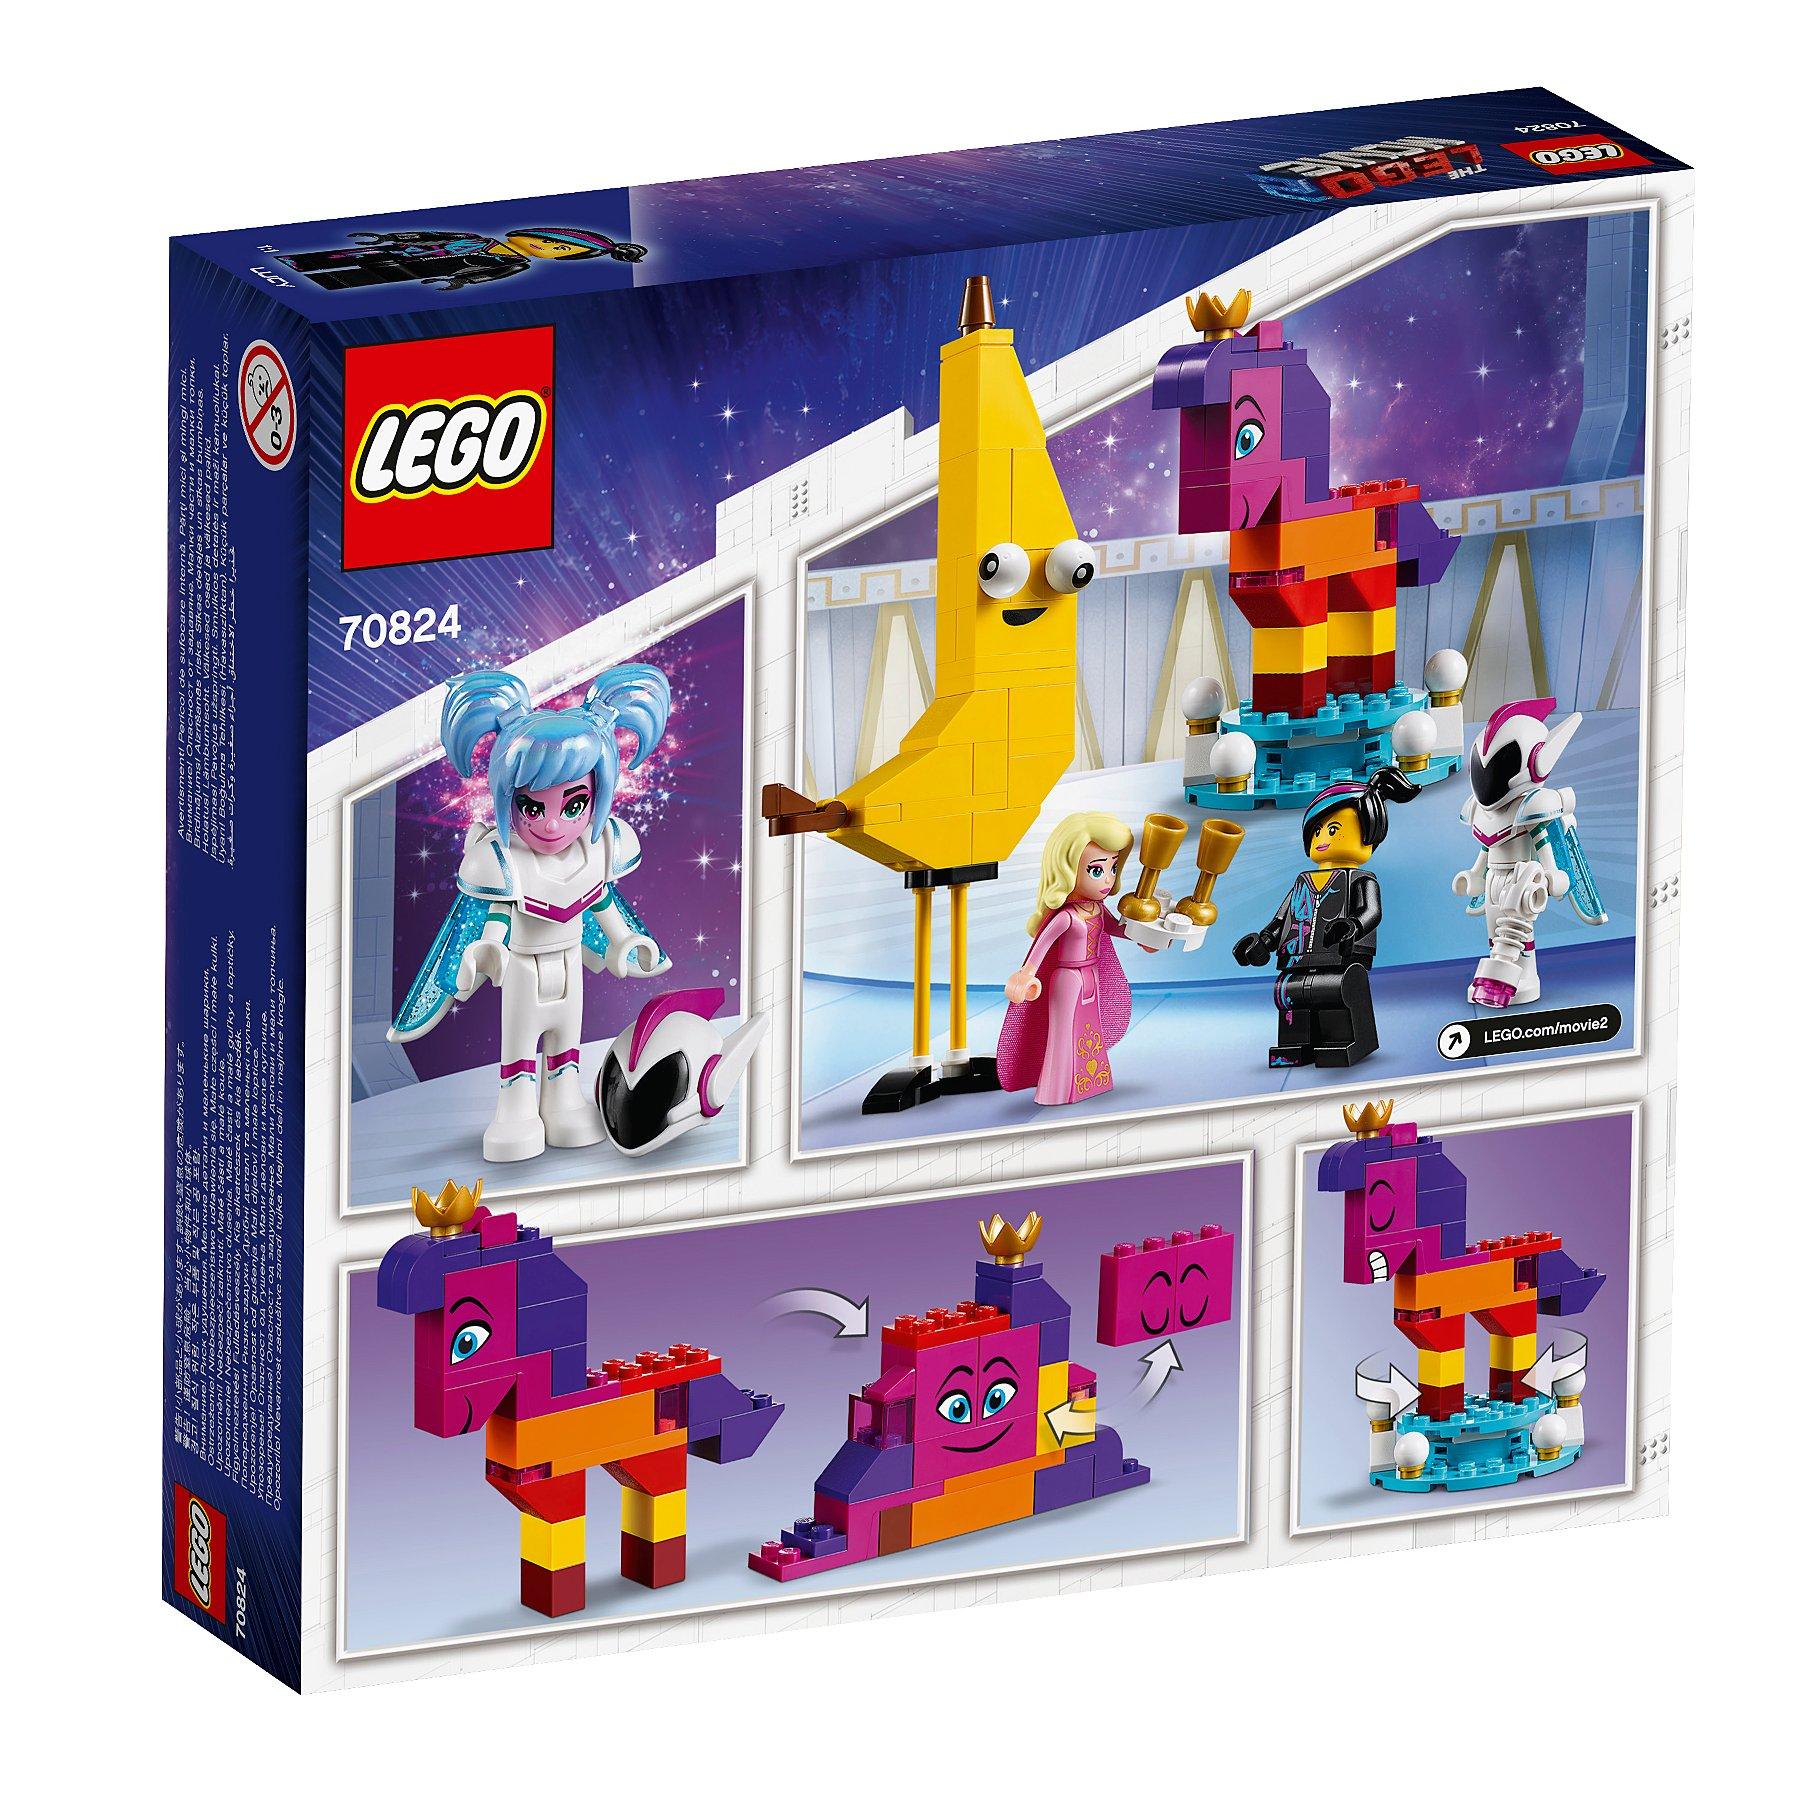 Lego Movie 2 70824 Introducing Queen Watevra Wanabi Toys